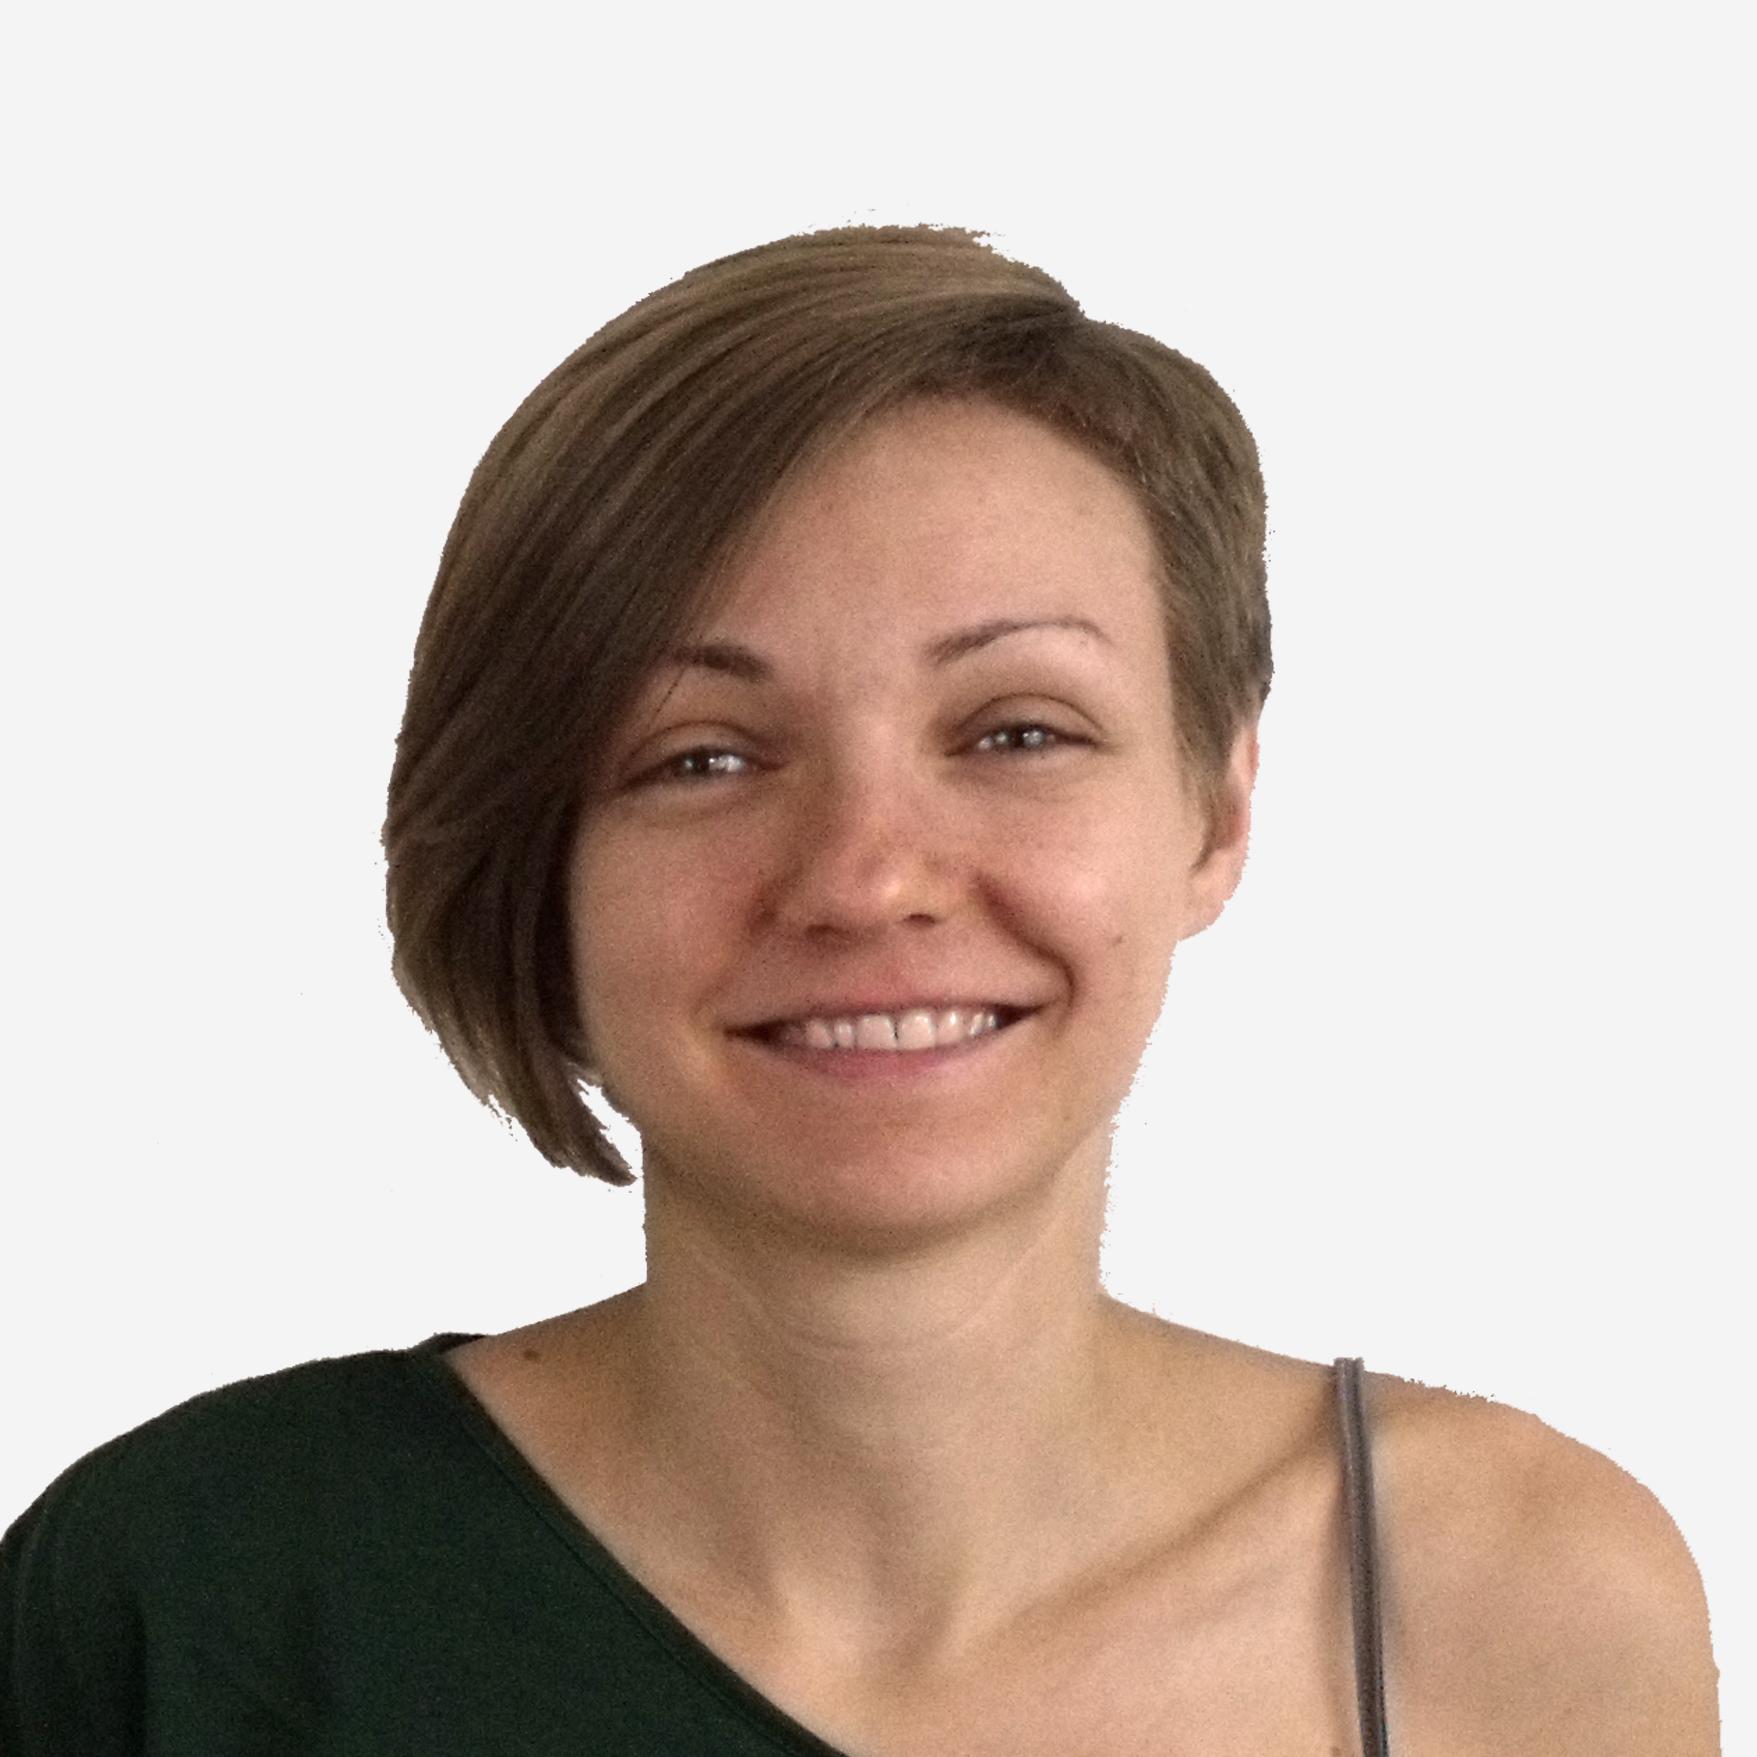 Molnár-Katalin